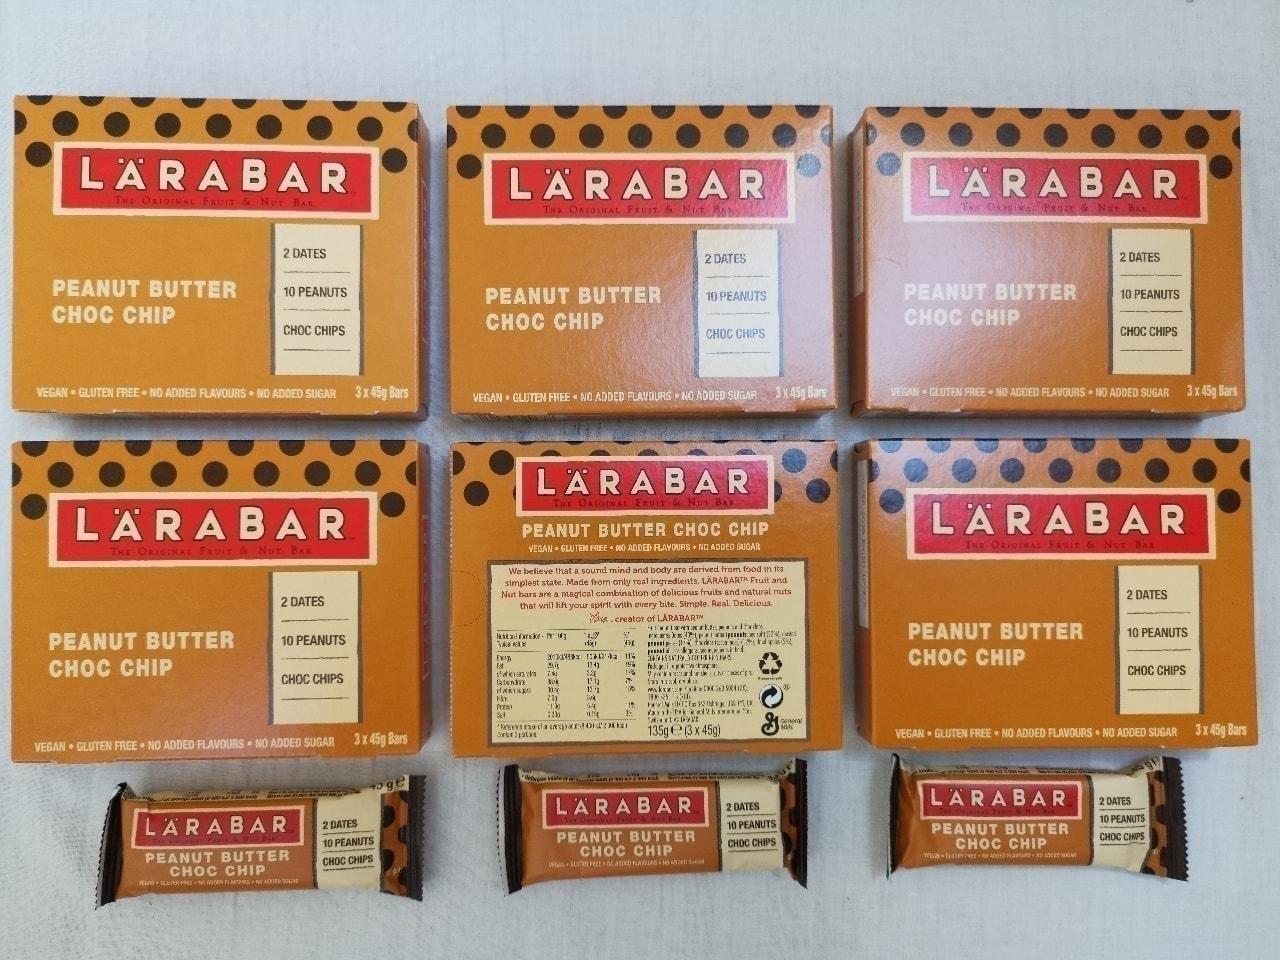 Peanut Butter Choc Chip Energy Bars by LaraBar 🥜 🍫